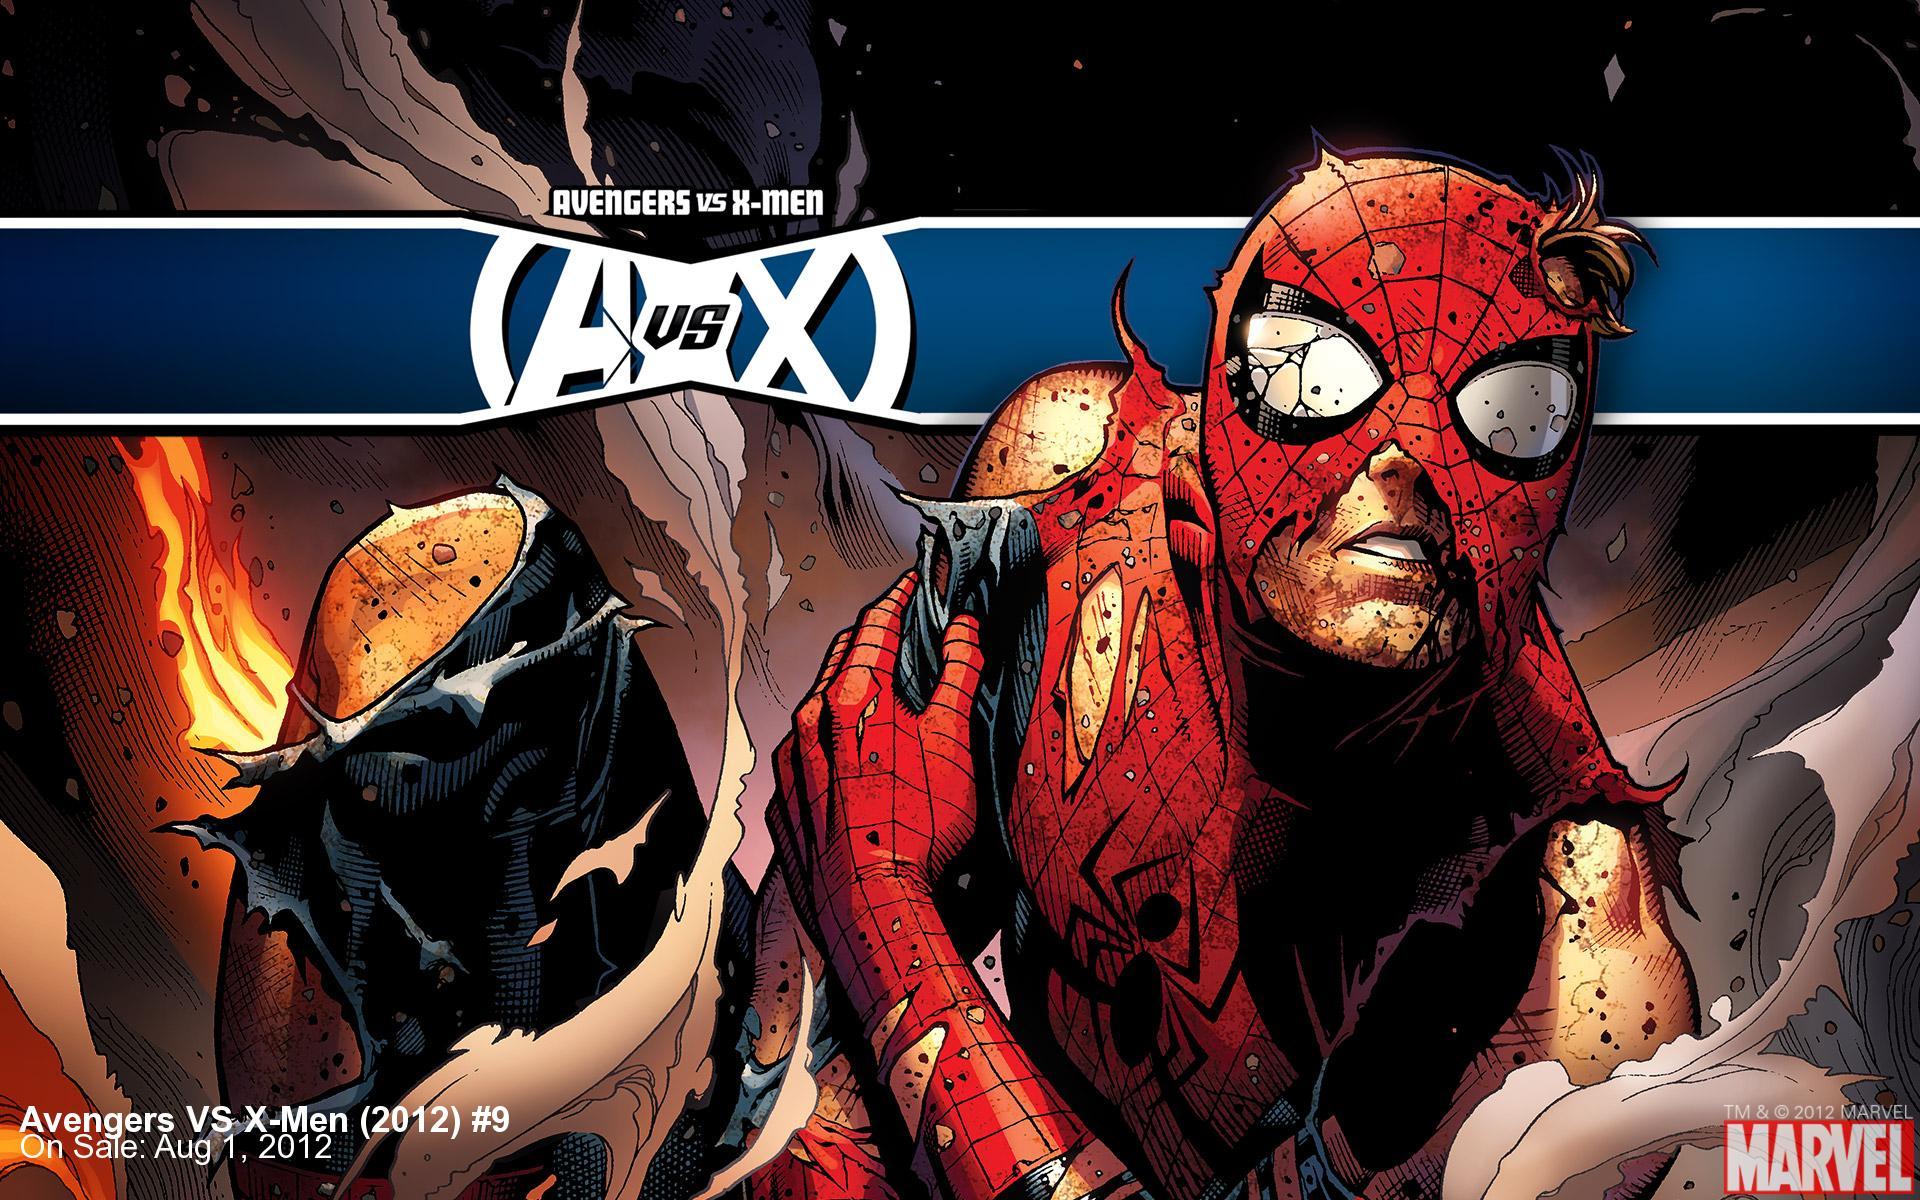 Top Wallpaper Marvel Xmen - wallpaper_widescreen  Gallery_856135.jpg